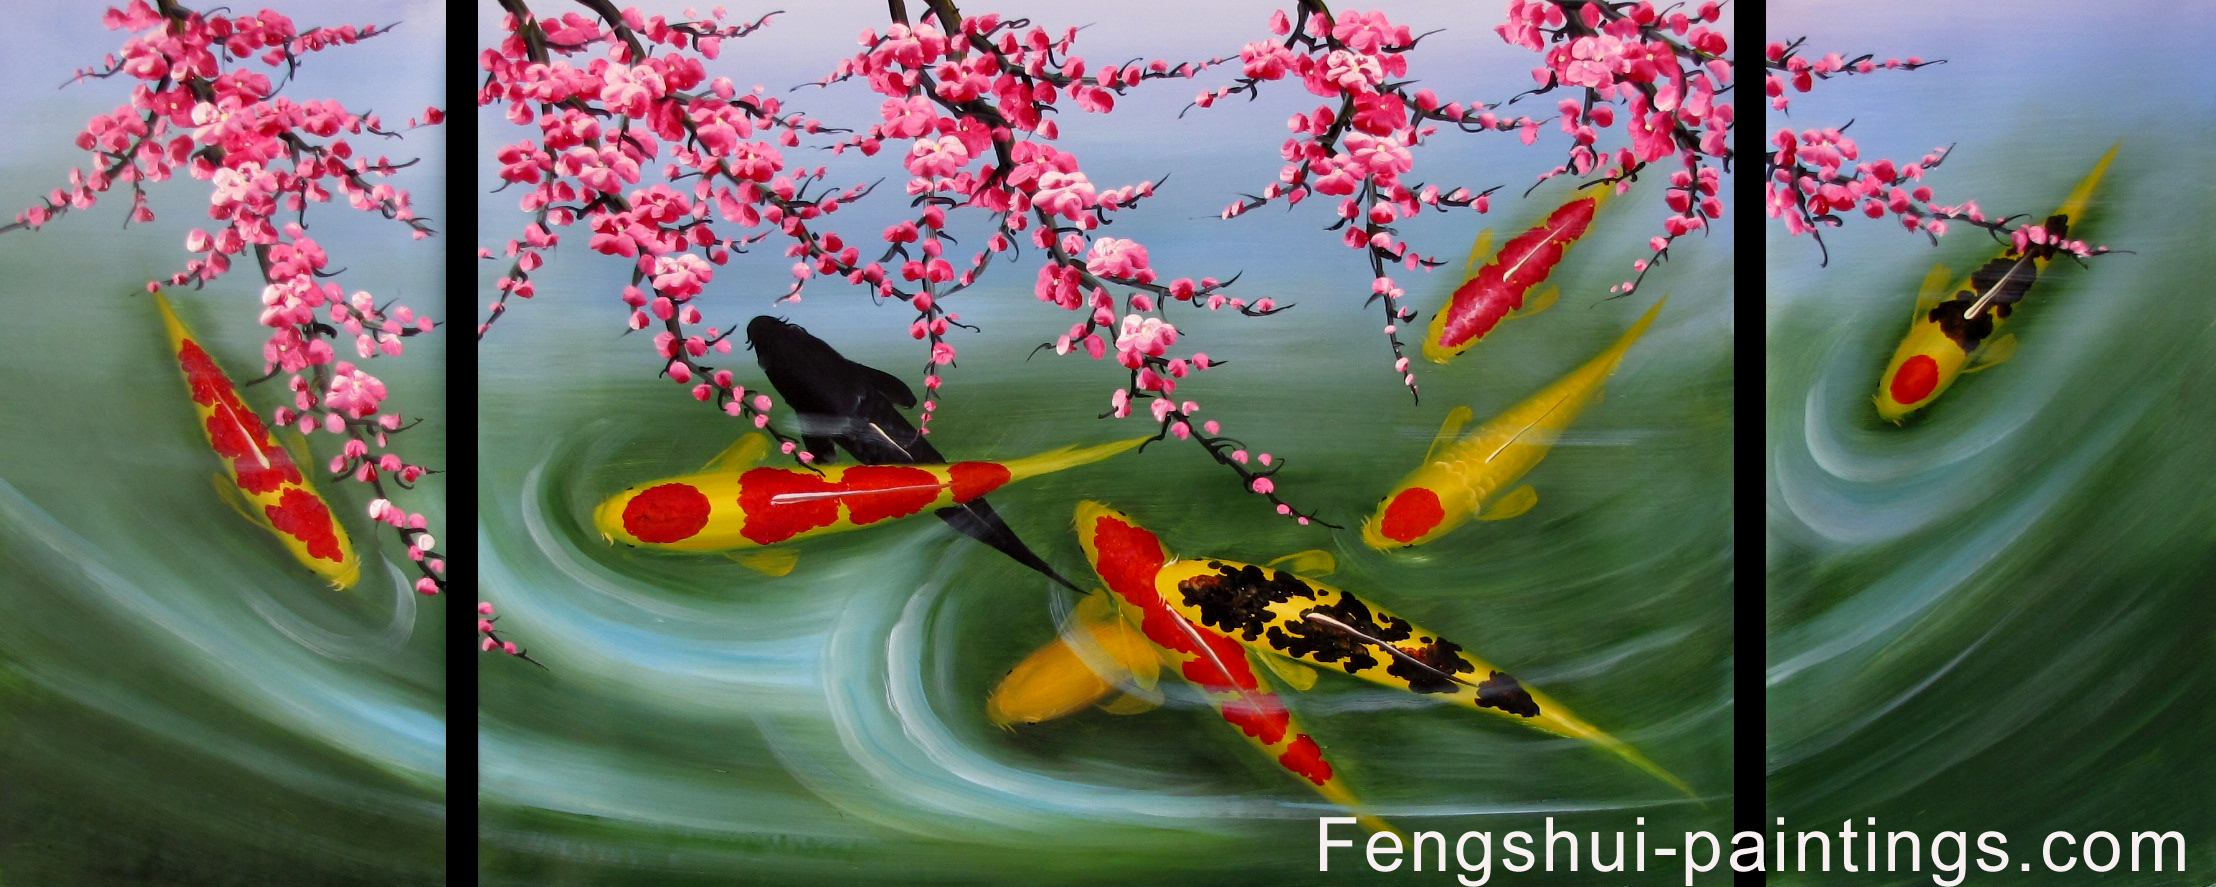 Koi Painting, Koi Fish Painting, Feng Shui Fish Painting